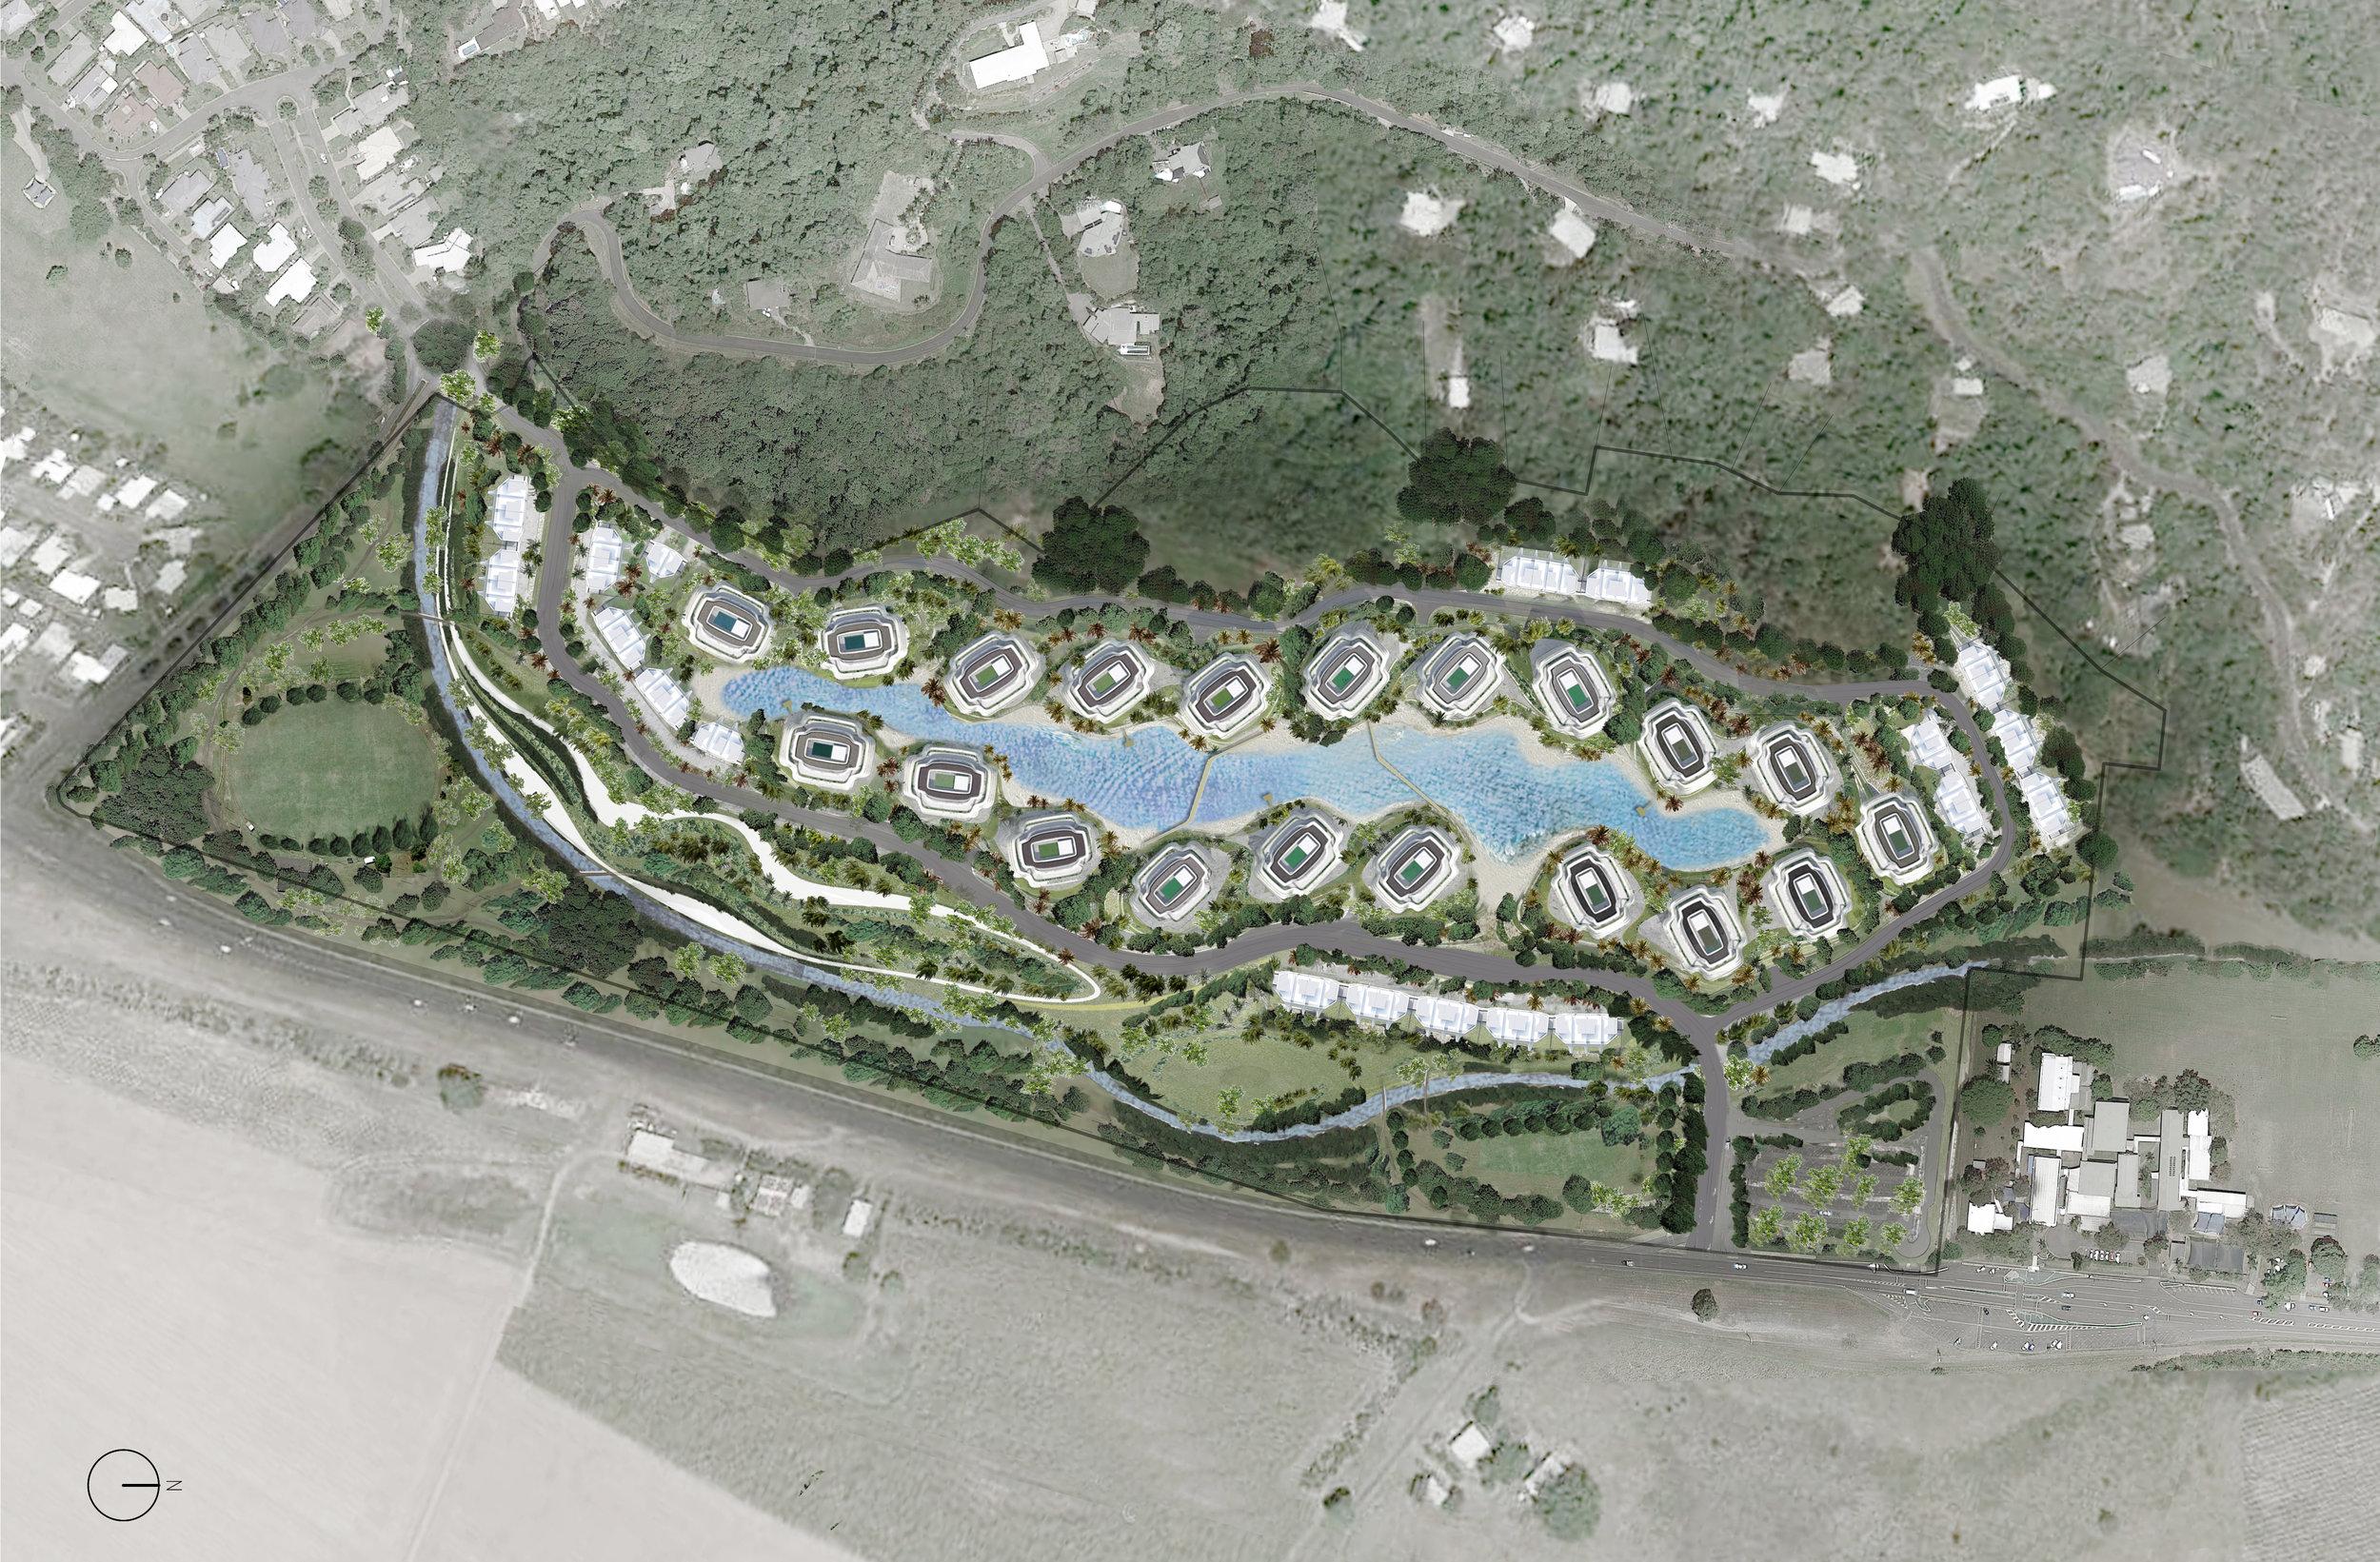 Contreras Earl_Botanica_Site Plan